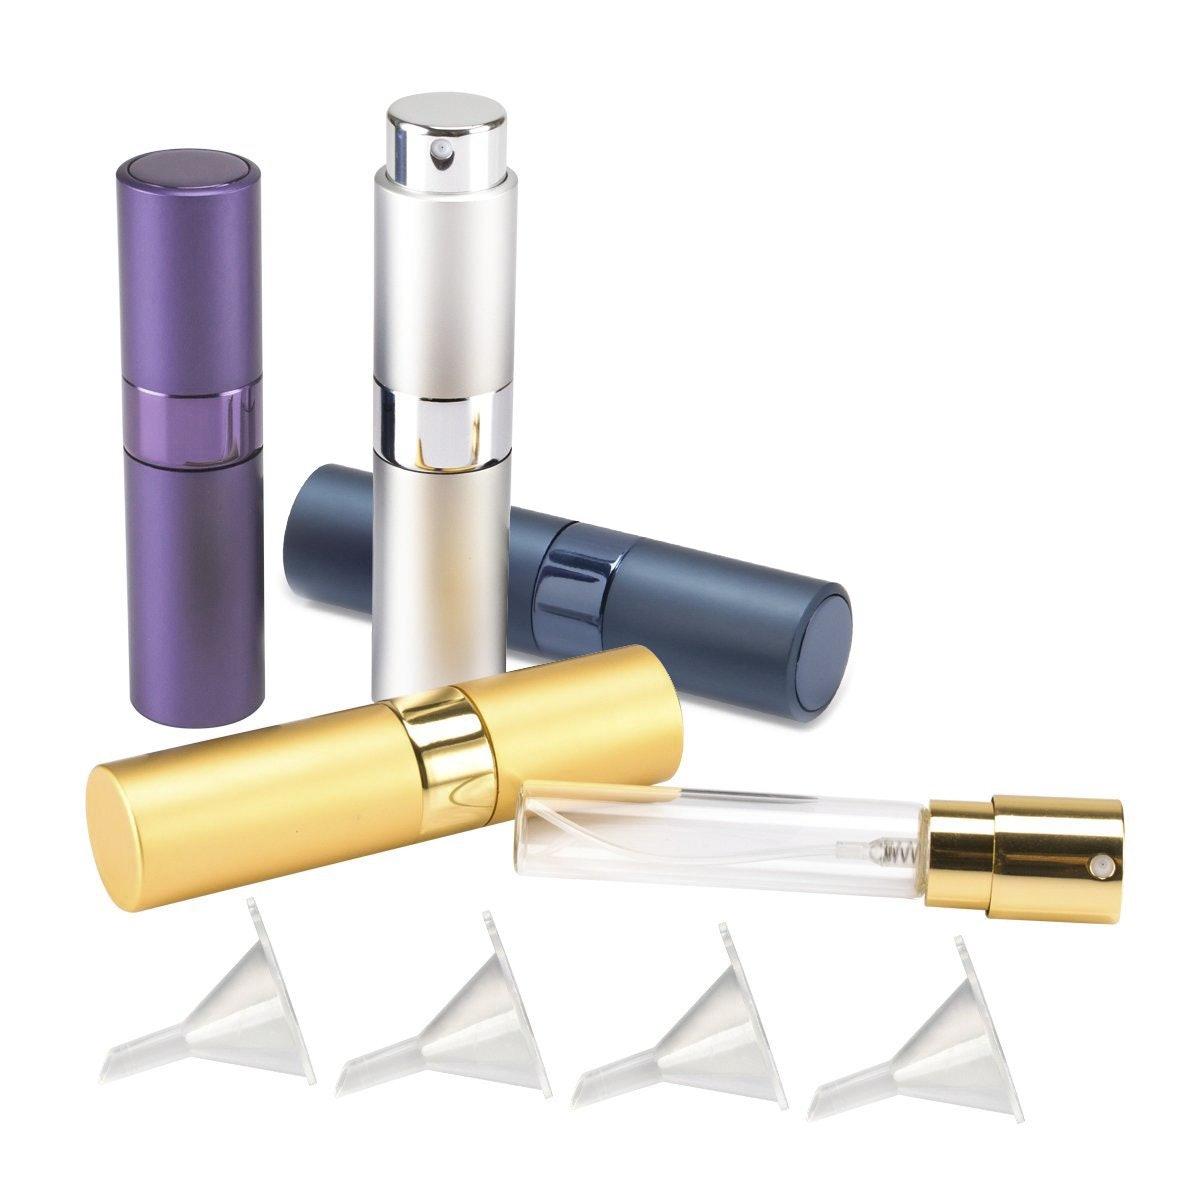 Madholly Twist-Up Perfume Spray Bottles (Set of 4)